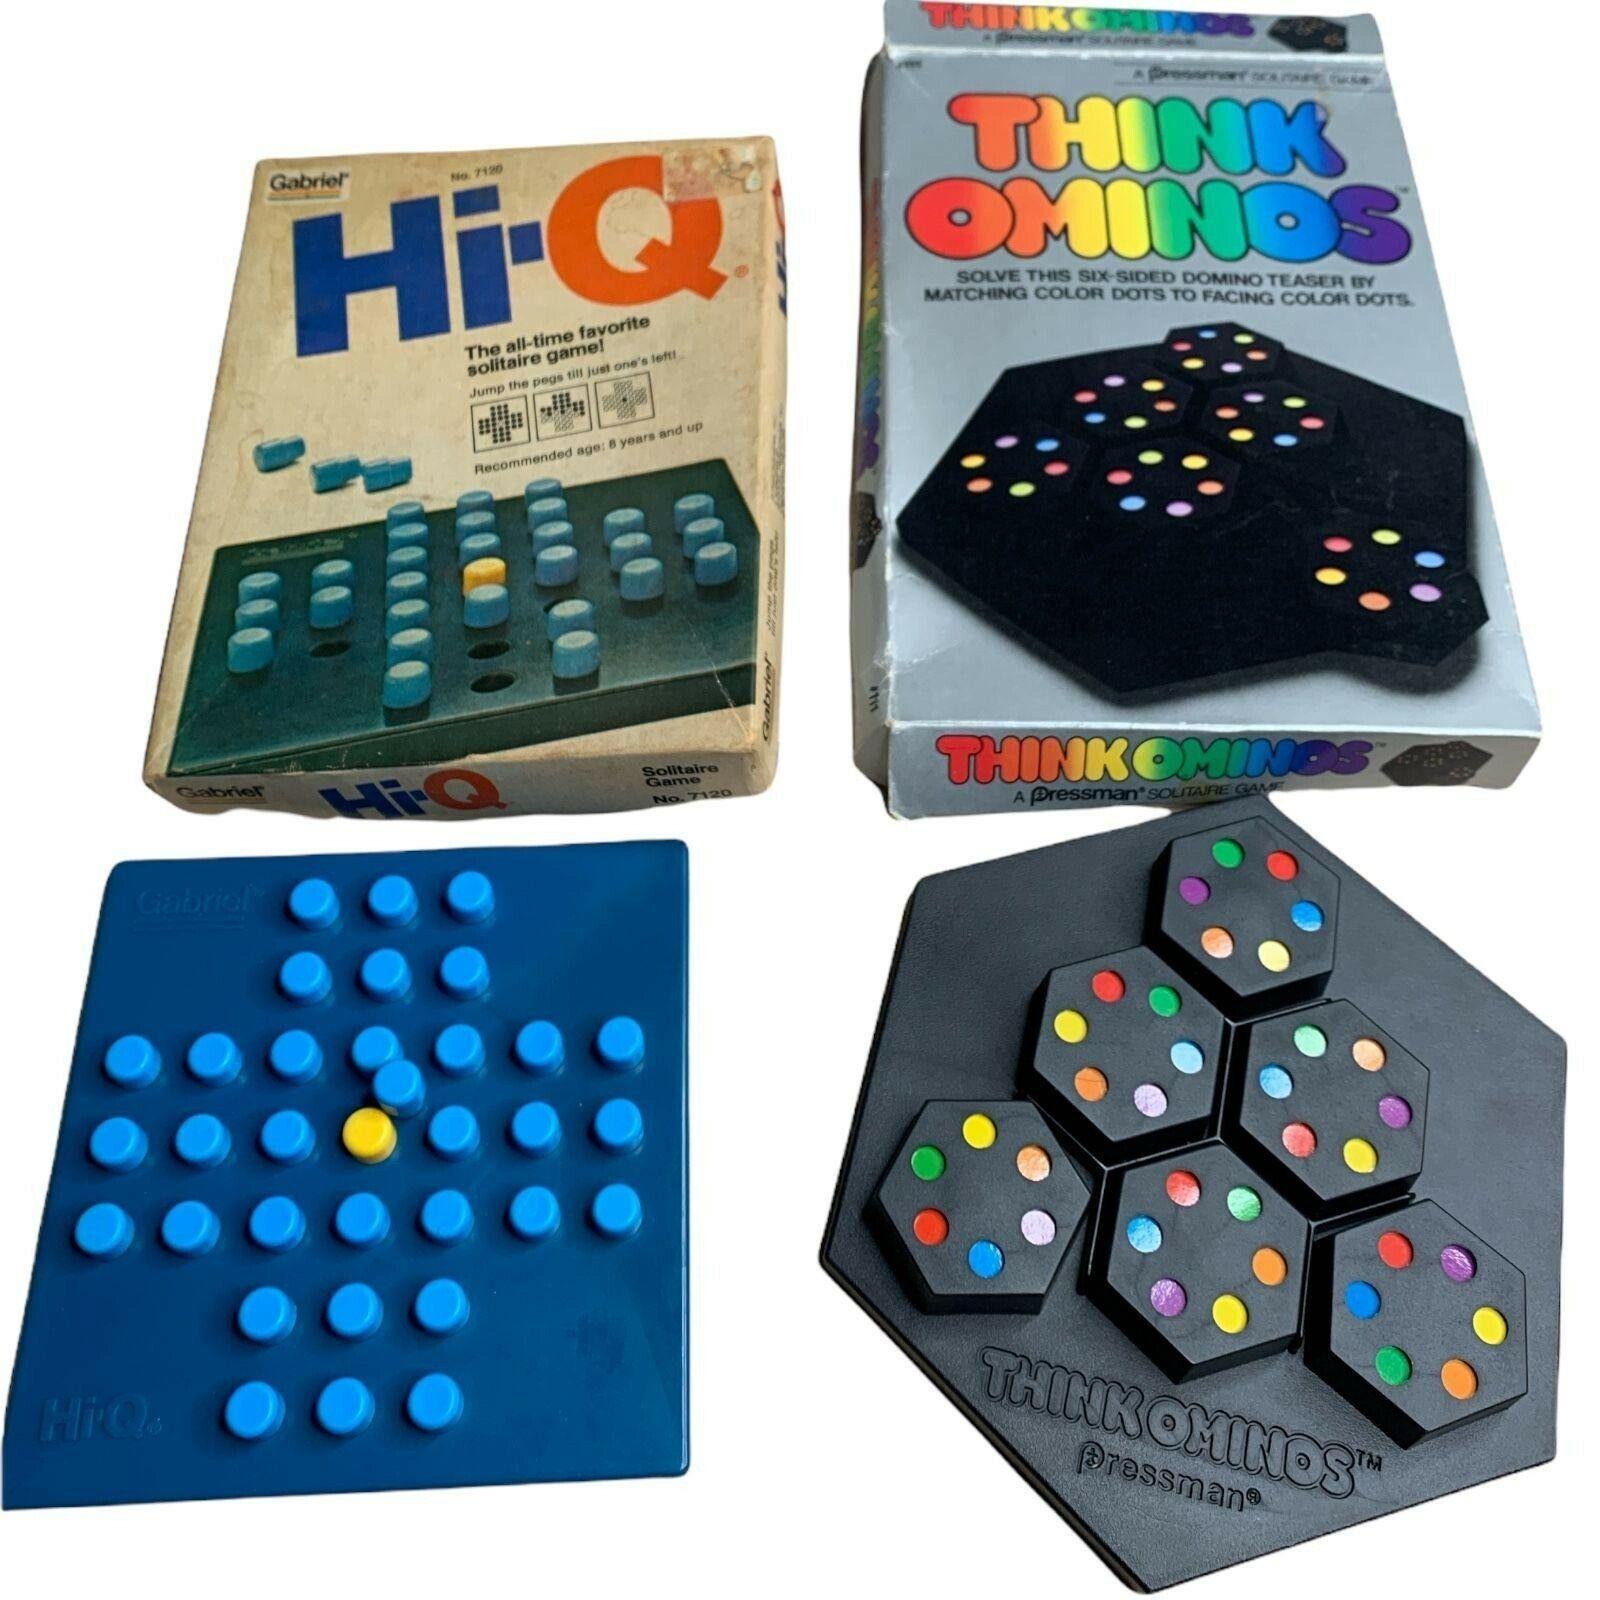 Vintage Solitare Games Think Ominos Pressman Hi-Q Gabriel - $20.00